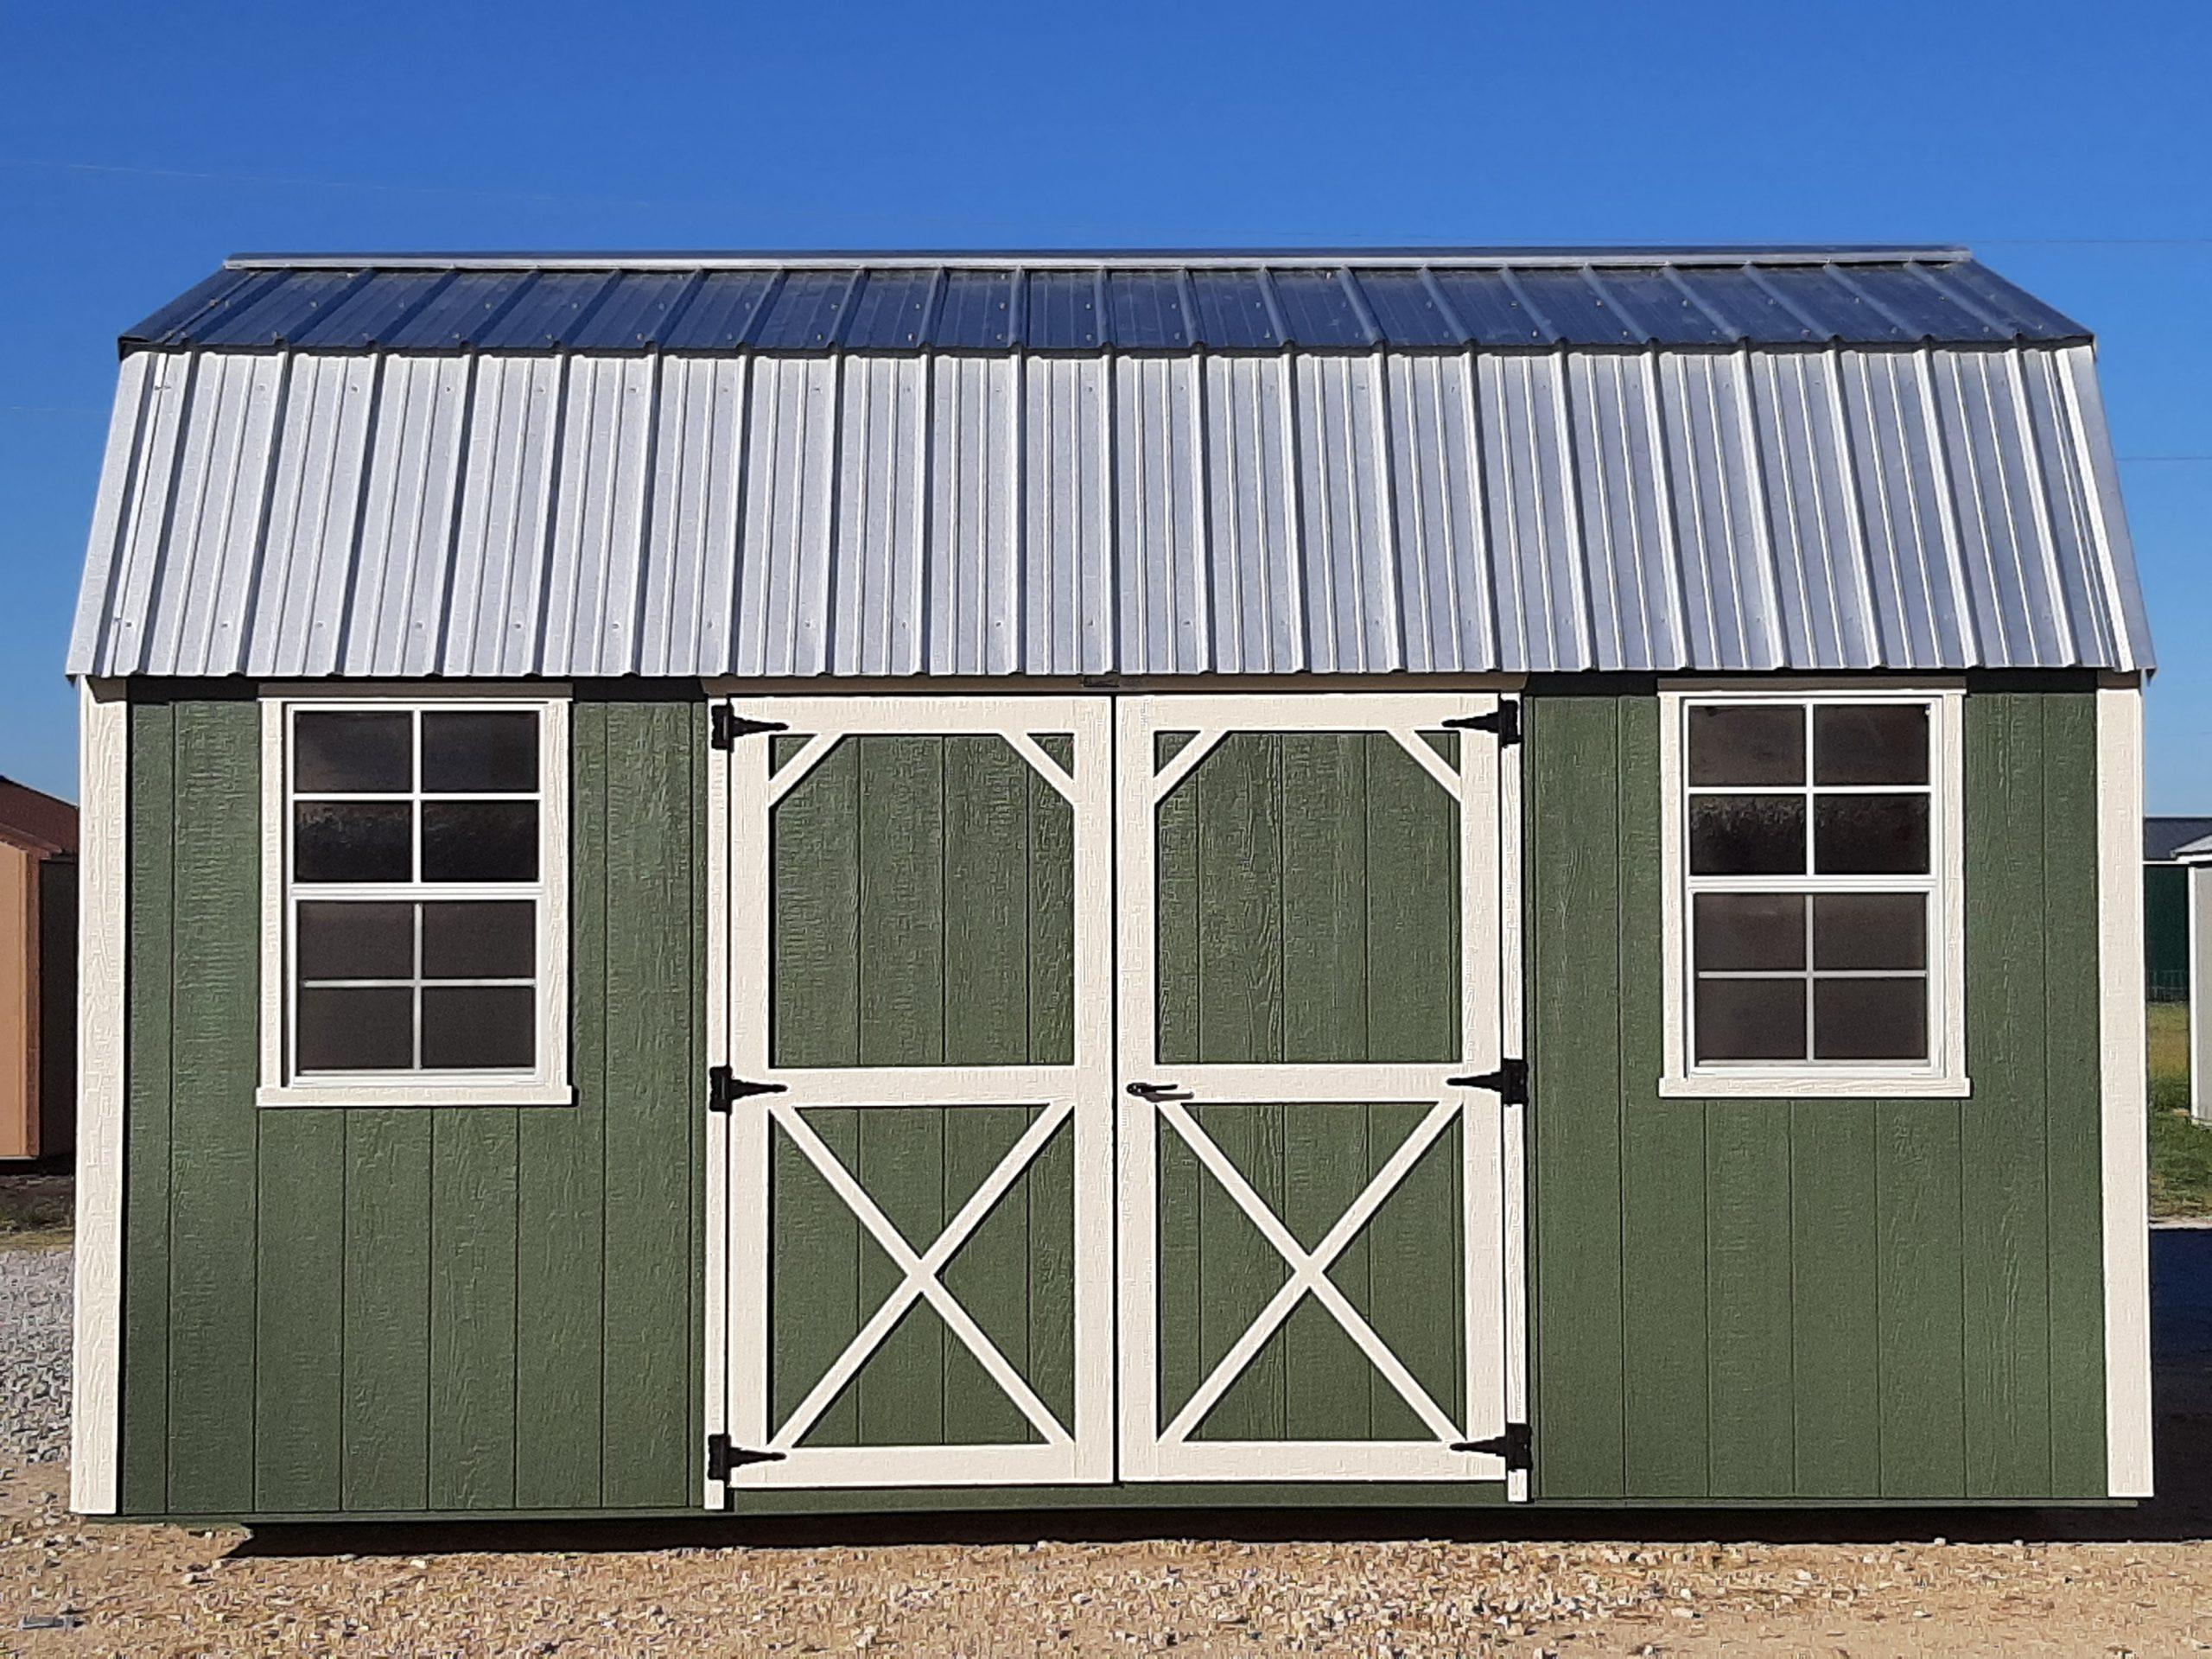 10x16 Lofted Barn #2409 Image